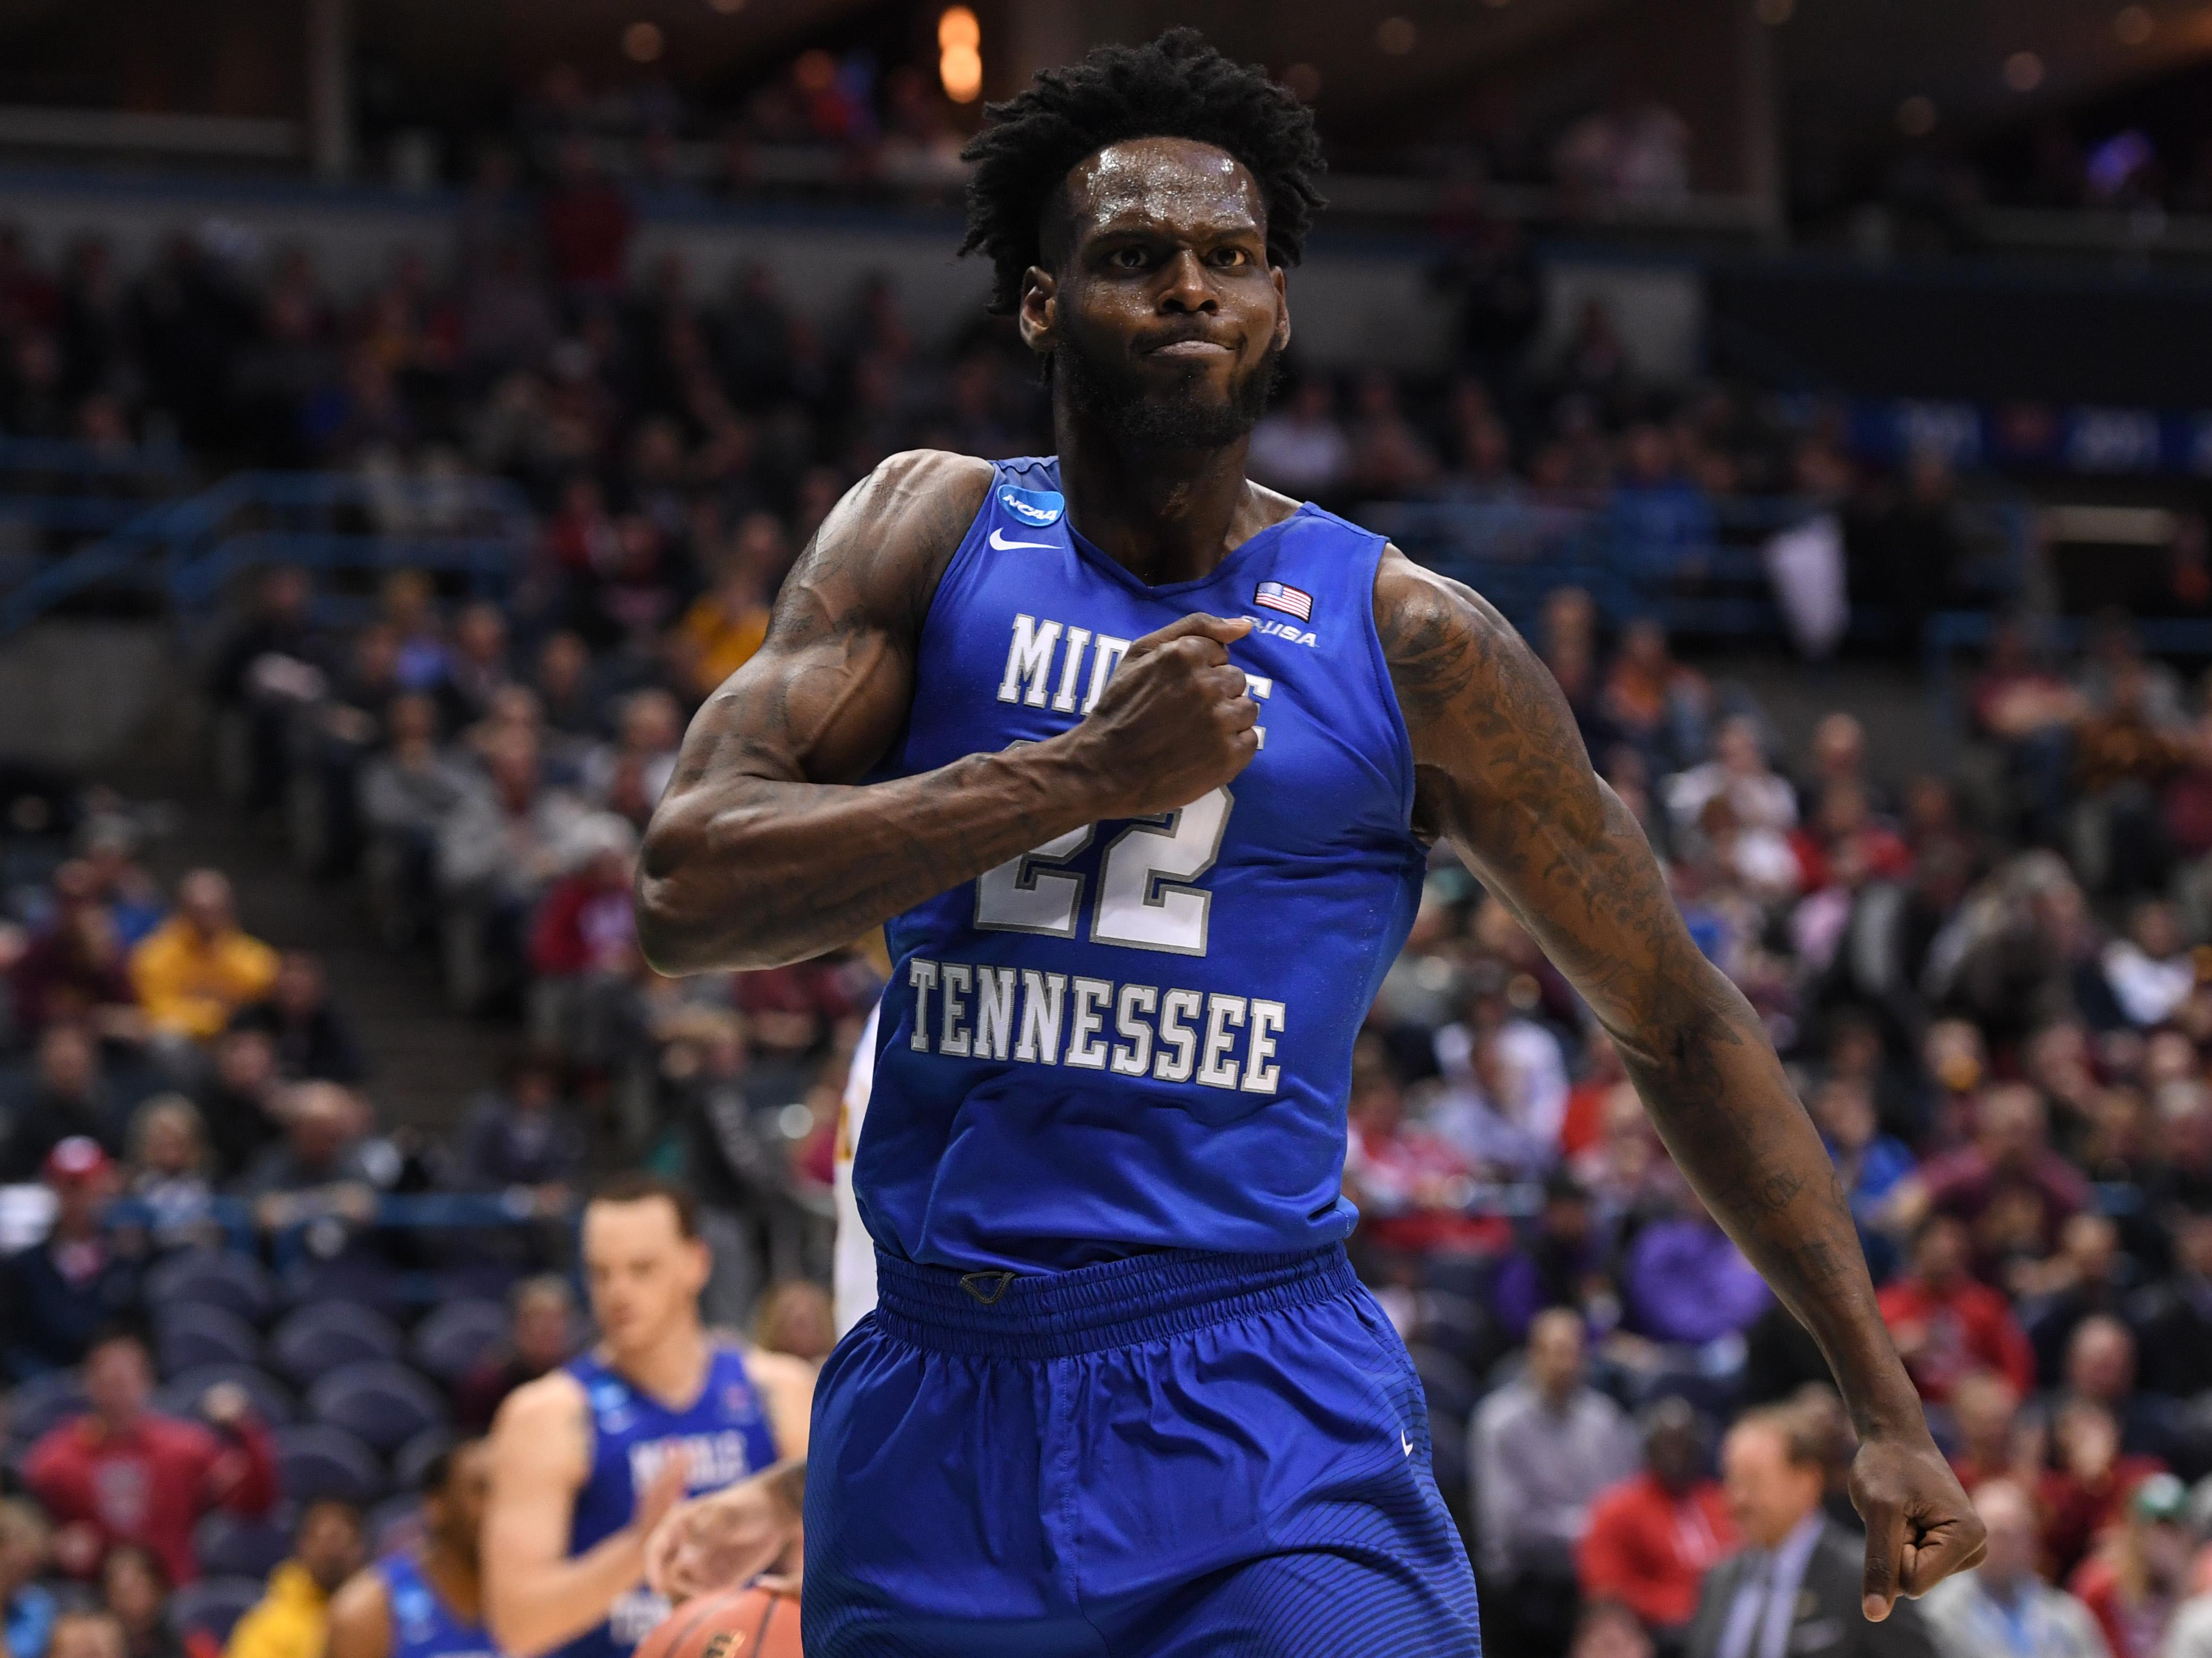 NCAA Basketball Tournament – First Round – Milwaukee